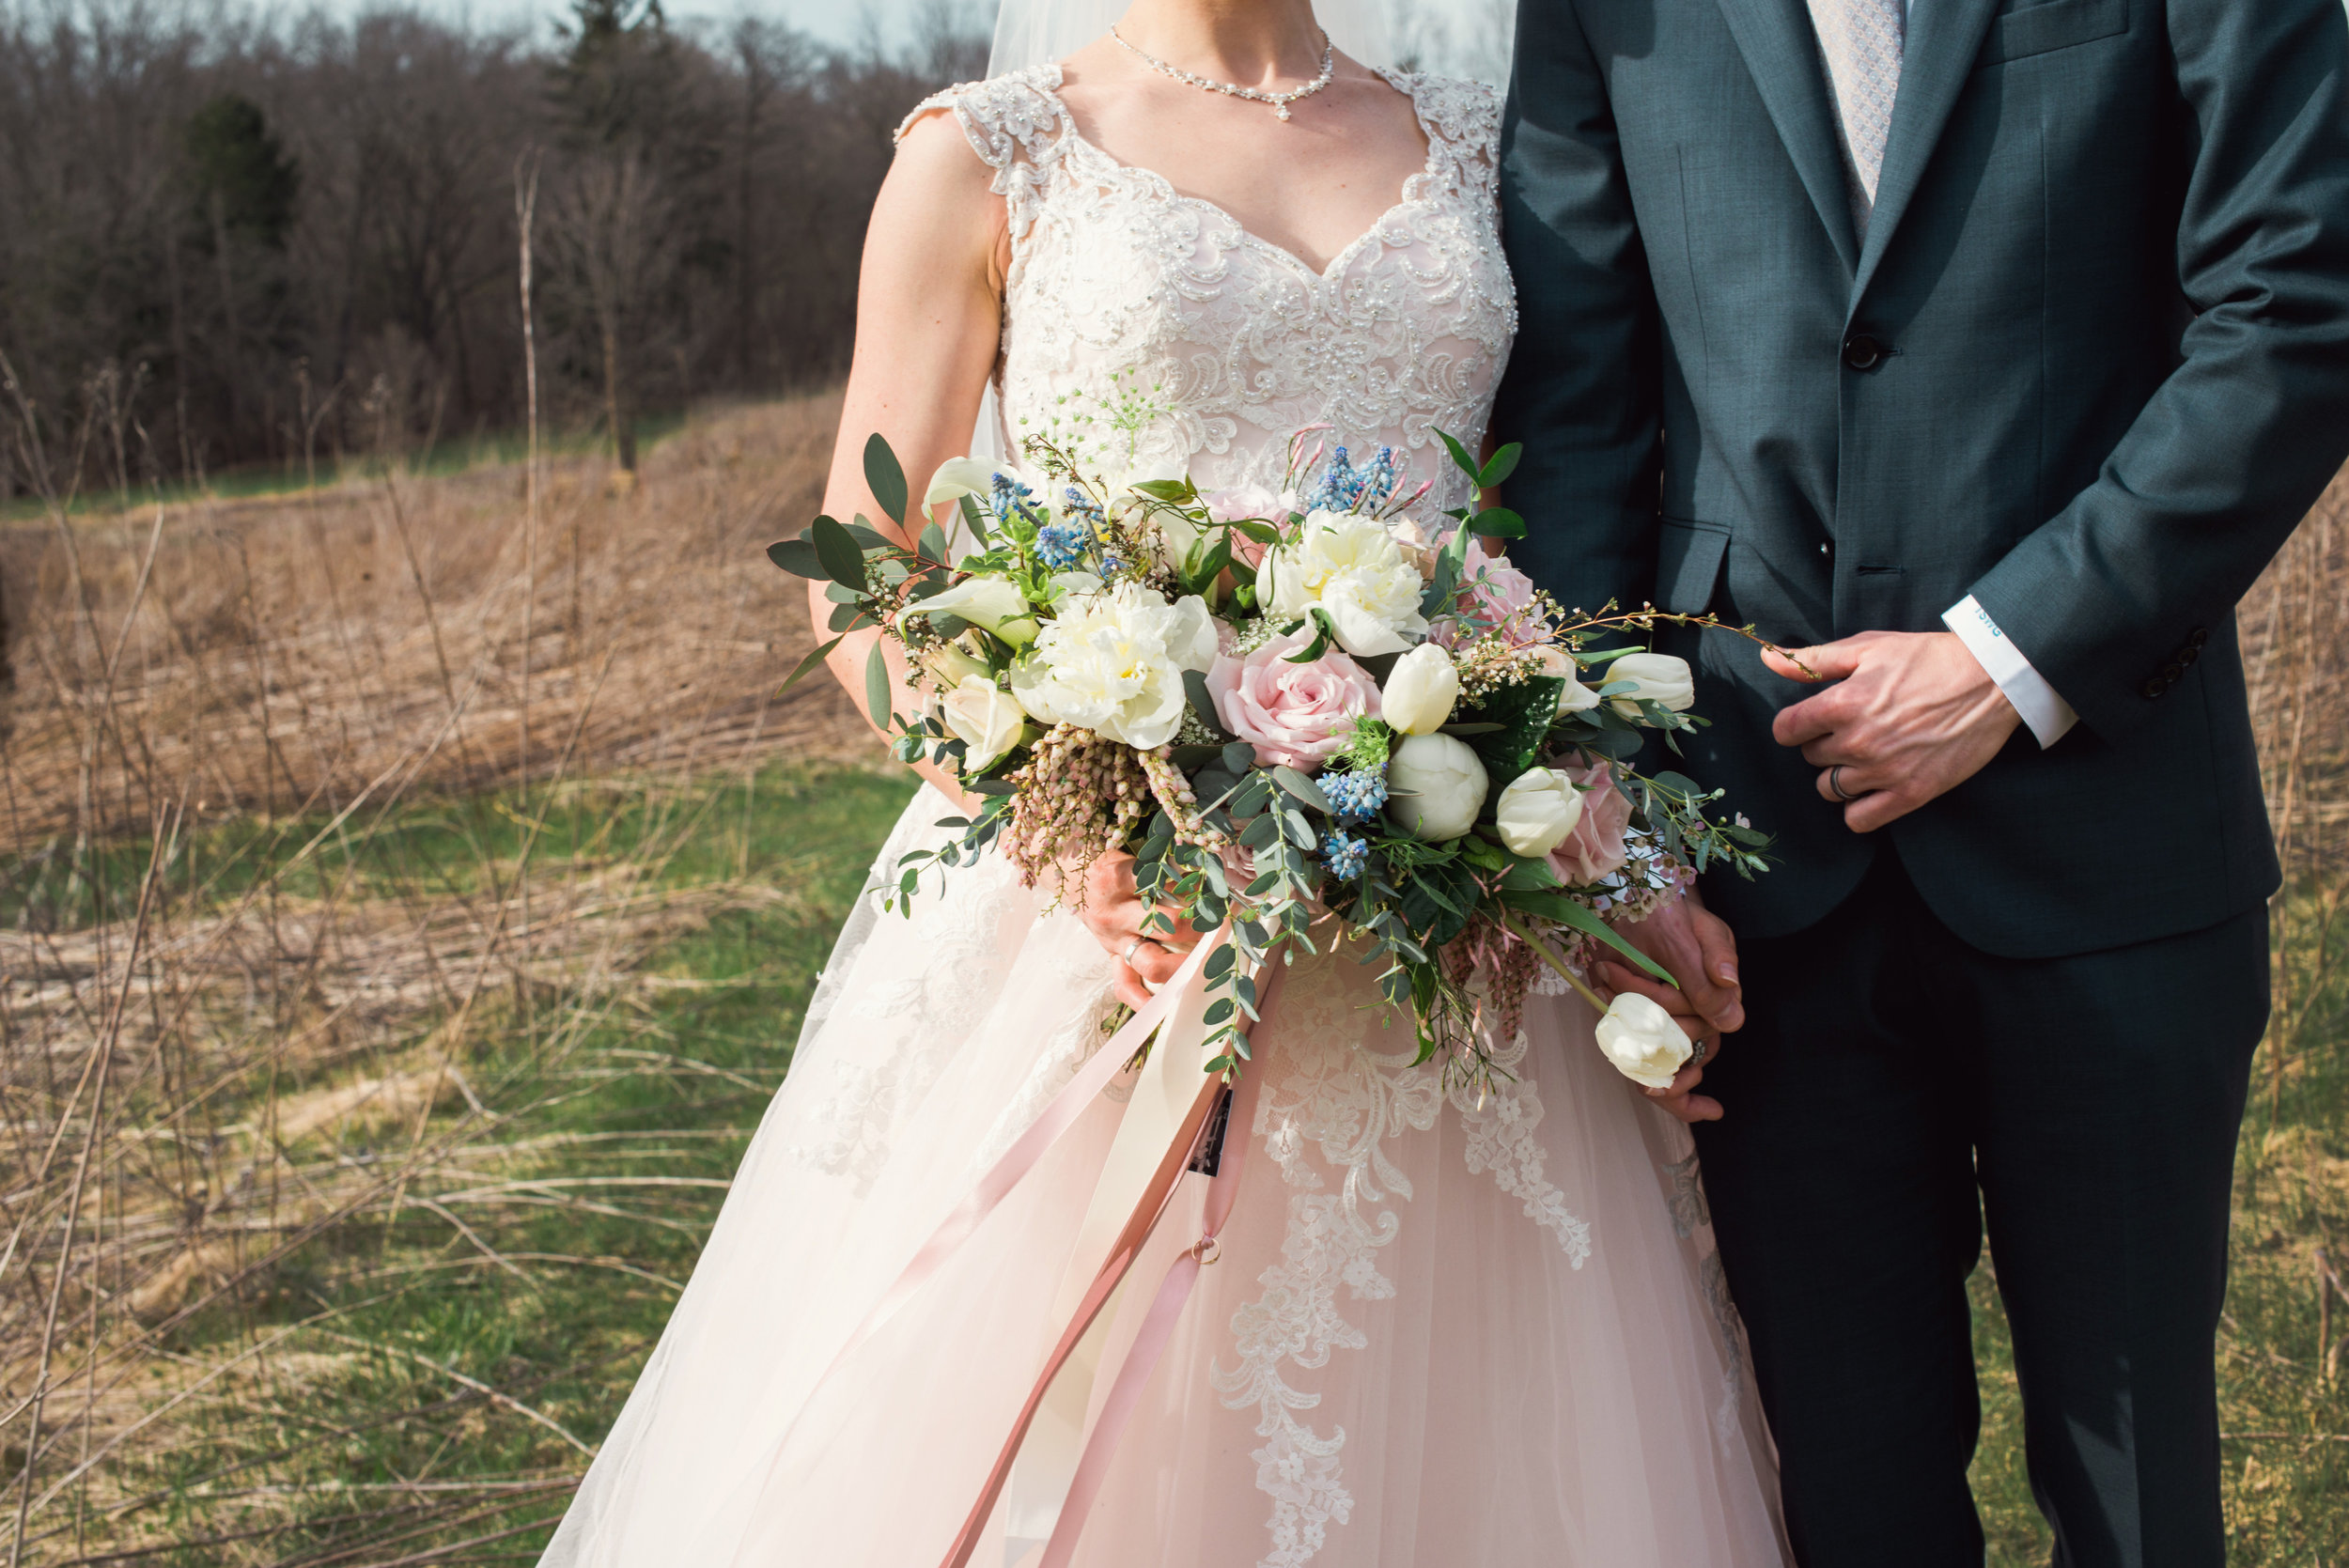 Chrystal & Lucas Photography